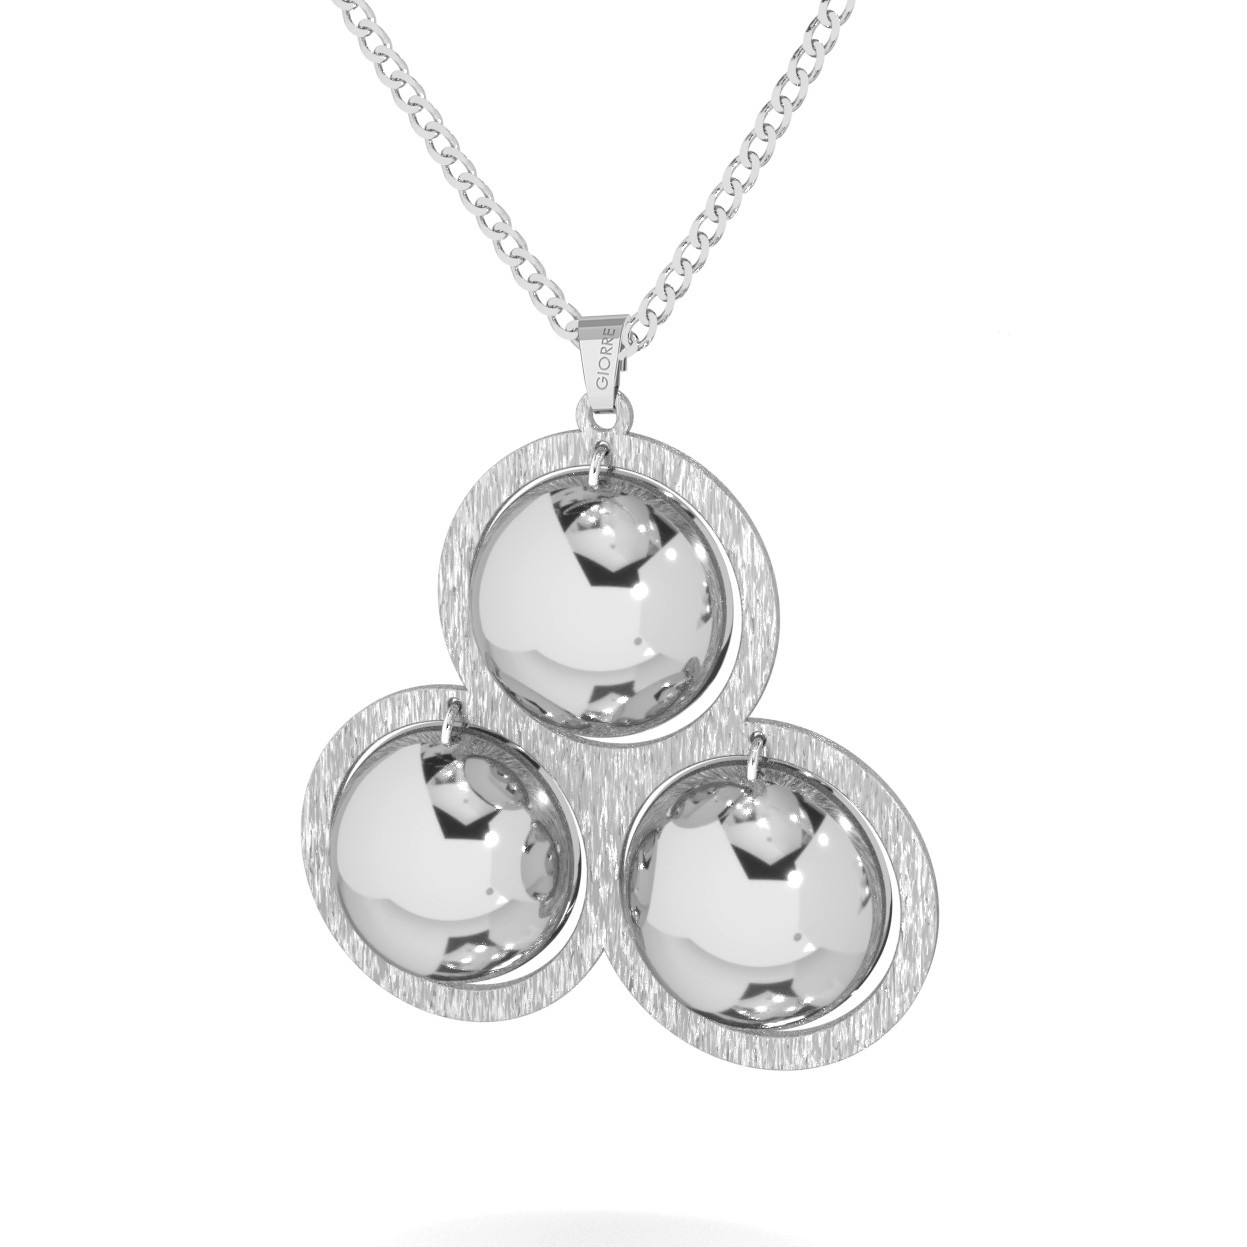 Srebrny naszyjnik trójkąt wypukłe blaszki srebro 925